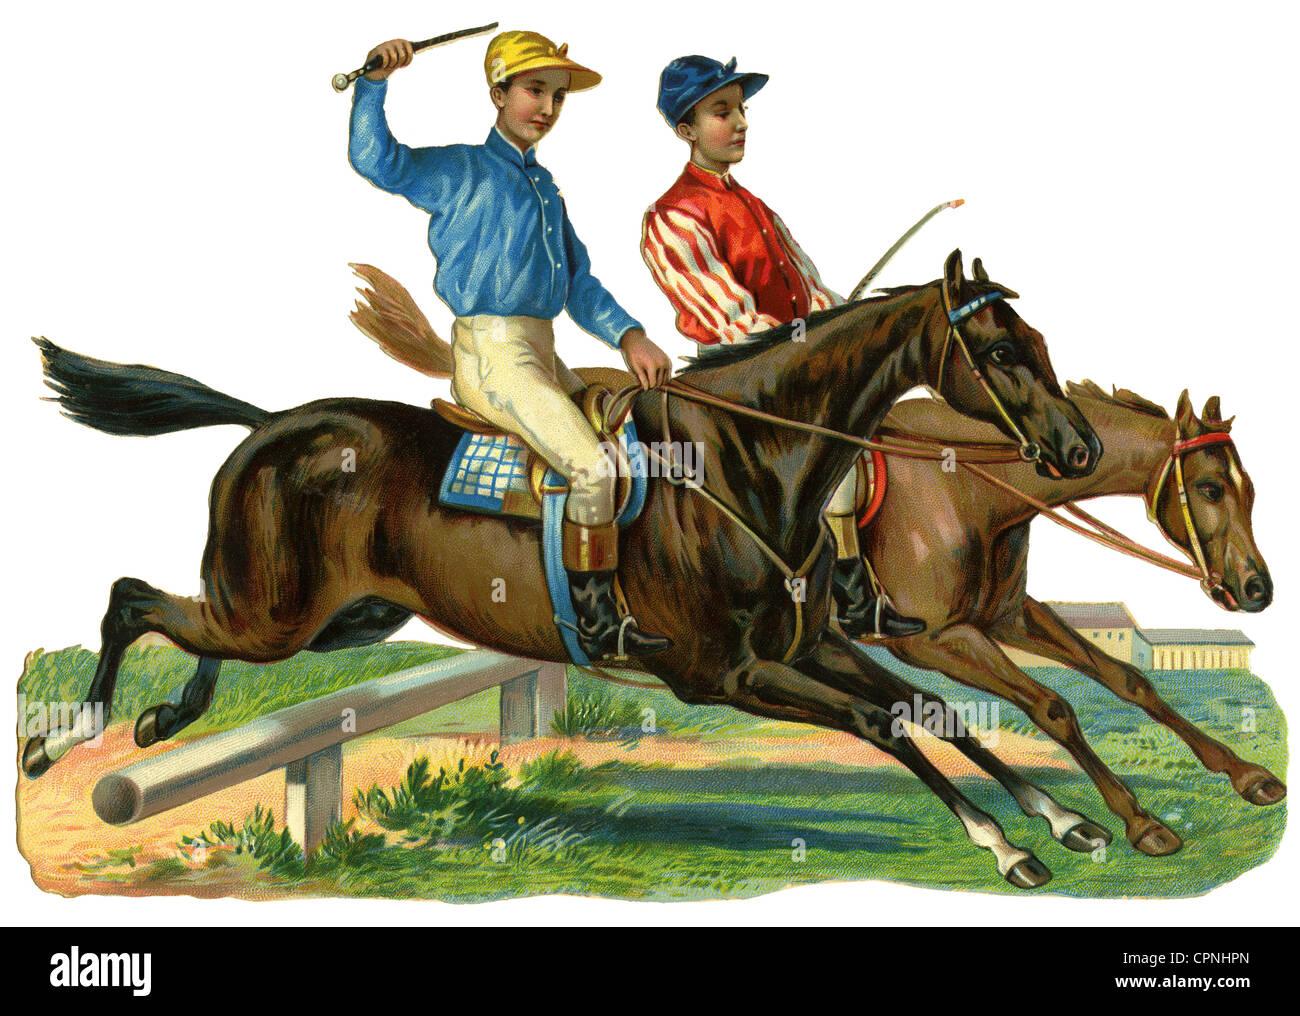 Sports Horse Riding Horse Racing Jockeys Jumping Over A